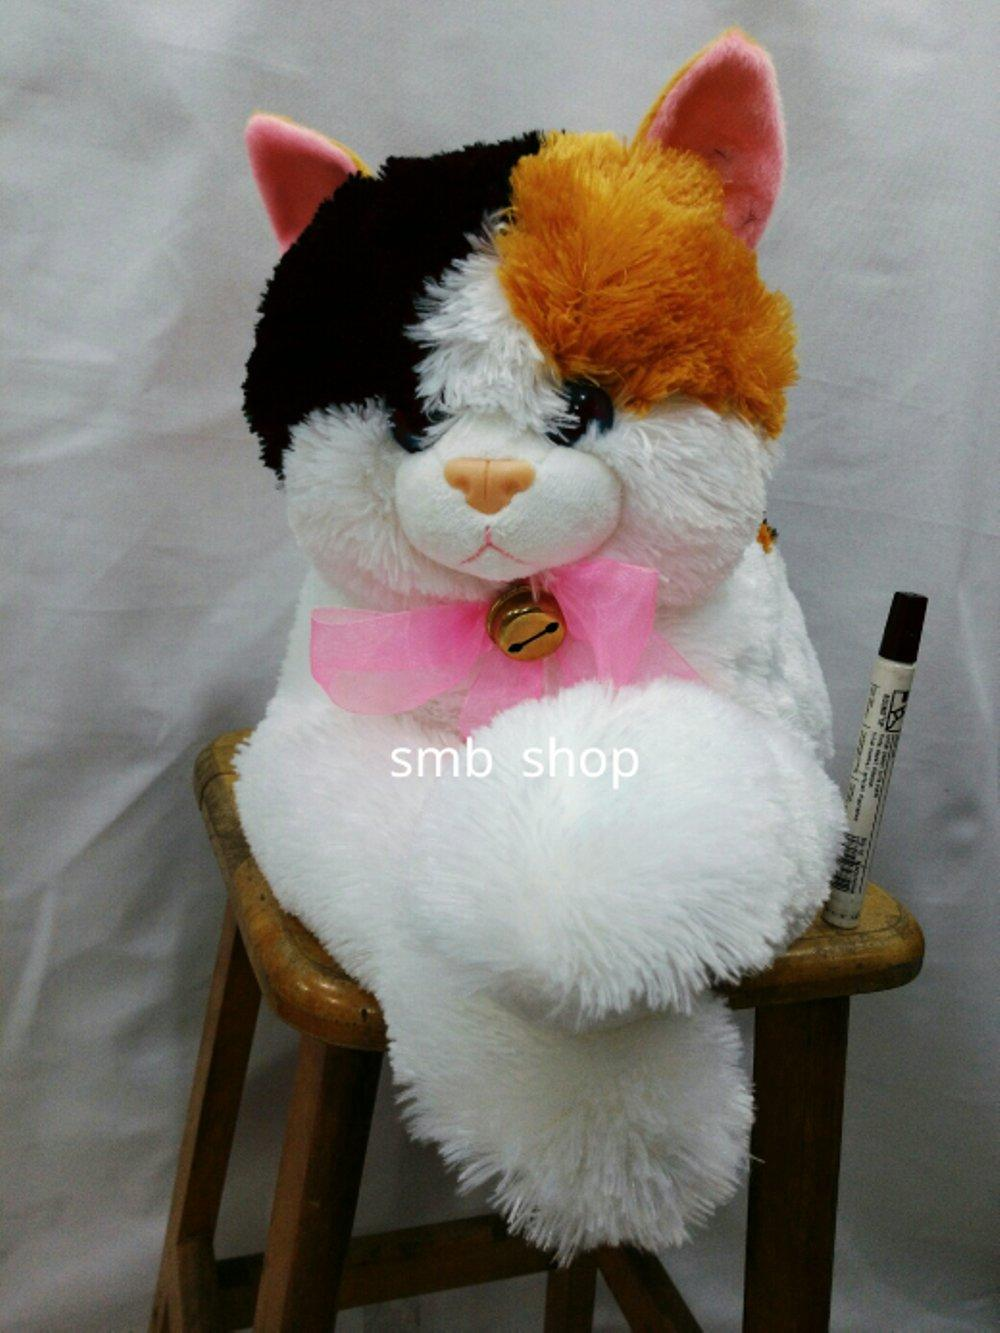 Bonek Kucing Cantik Banget Ada Lonceng Besar   sinar makmur boneka  tomypanjie 02adcb5fd0